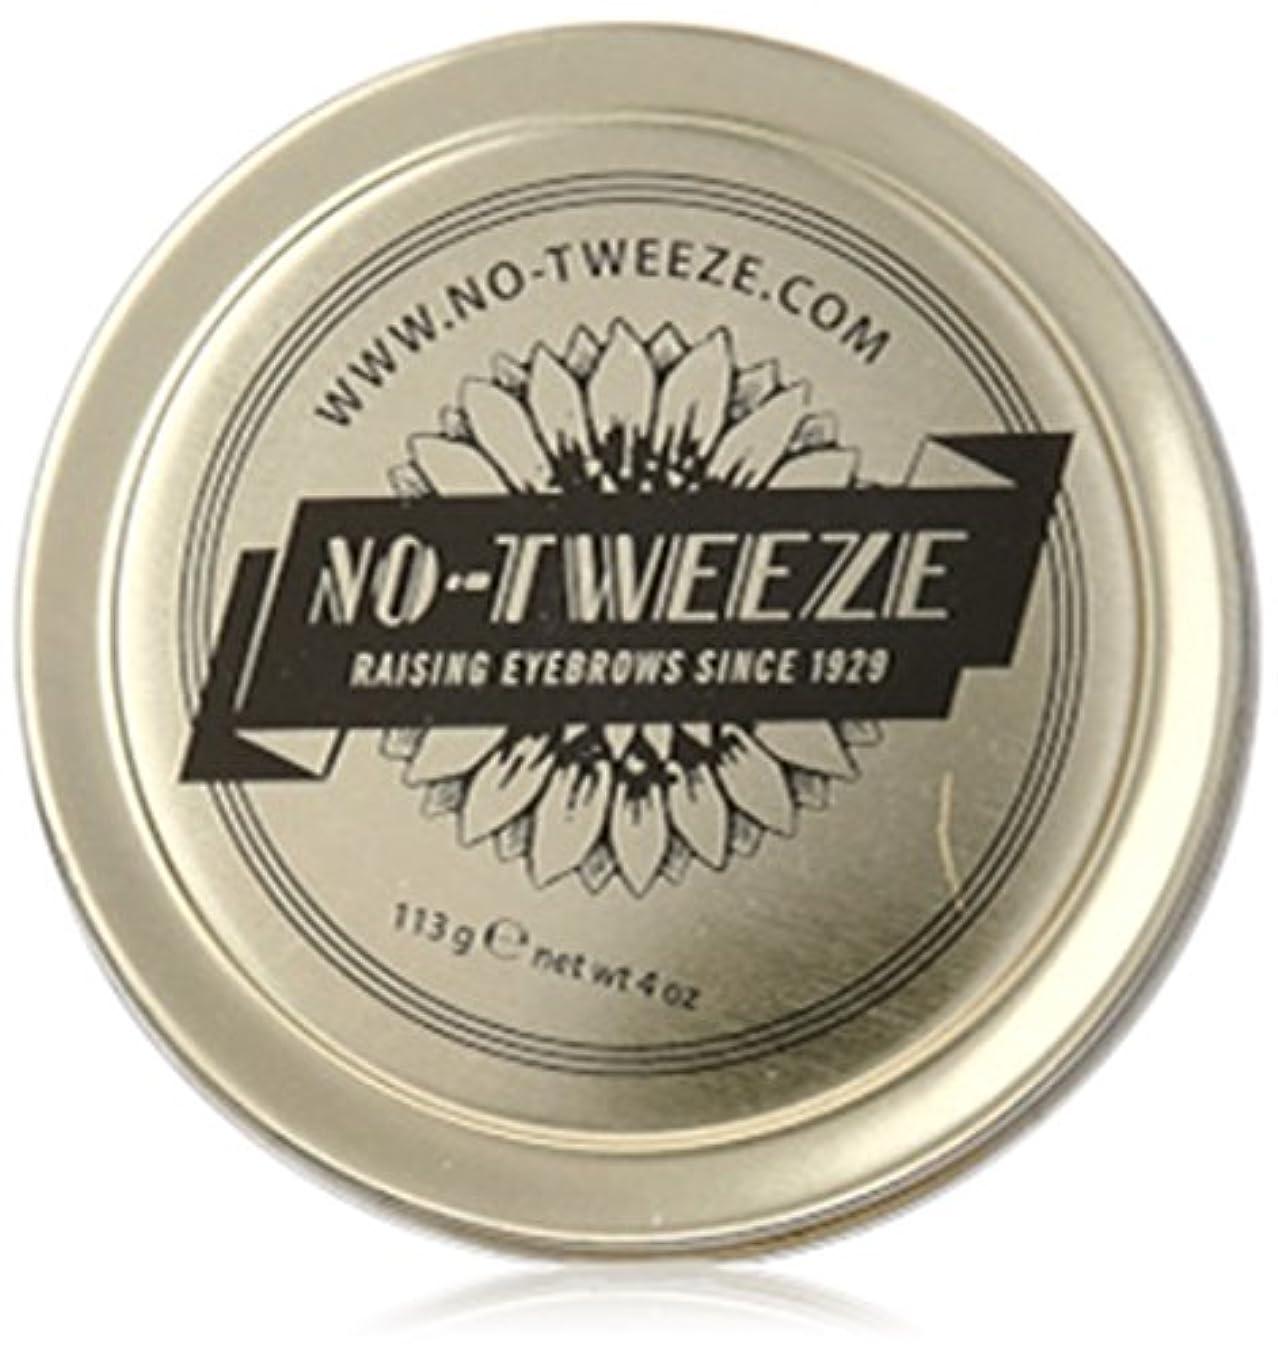 no-tweeze Classic Remover Wax, 4 Ounce by no tweeze